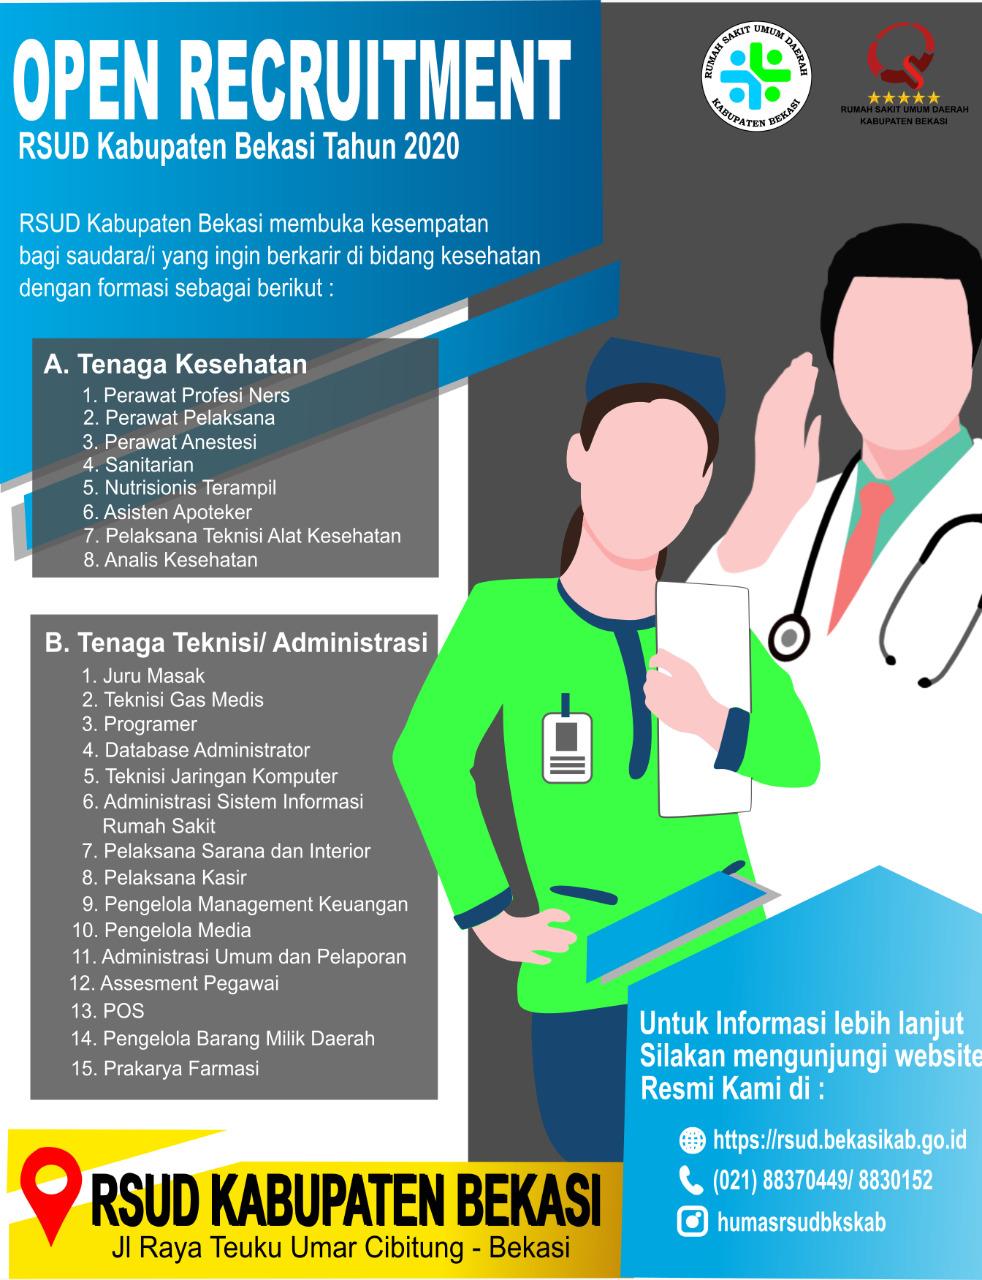 Lowongan Kerja Rekrutmen Rsud Kabupaten Bekasi Tahun 2020